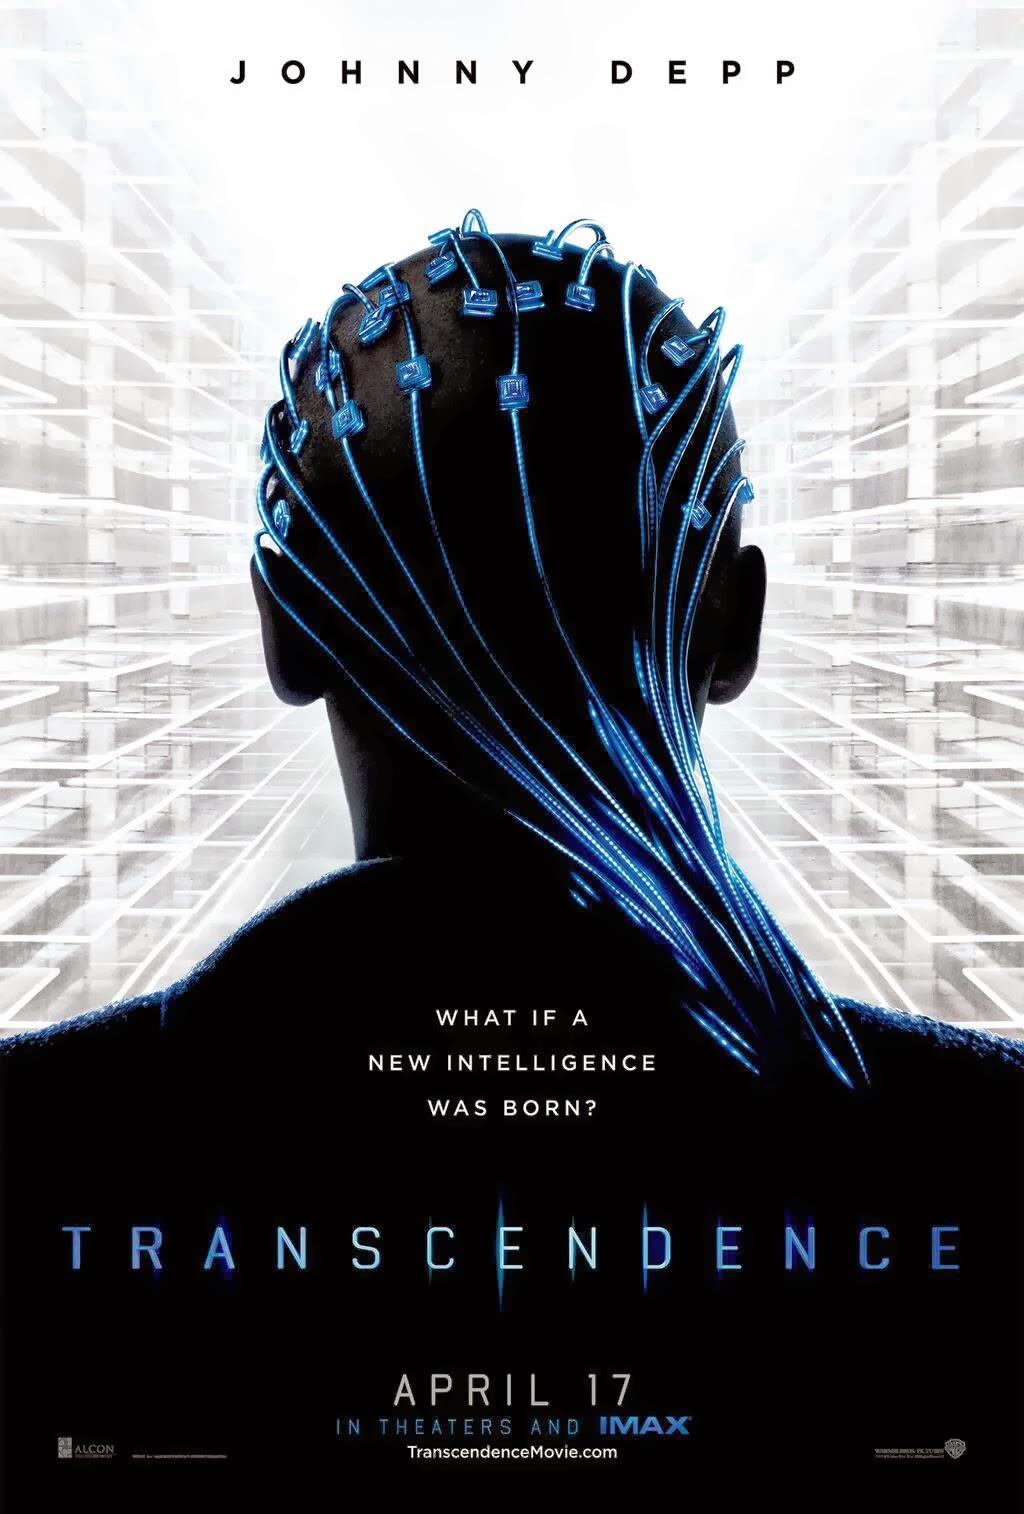 assistir franscendence dublado Transcendence Dublado